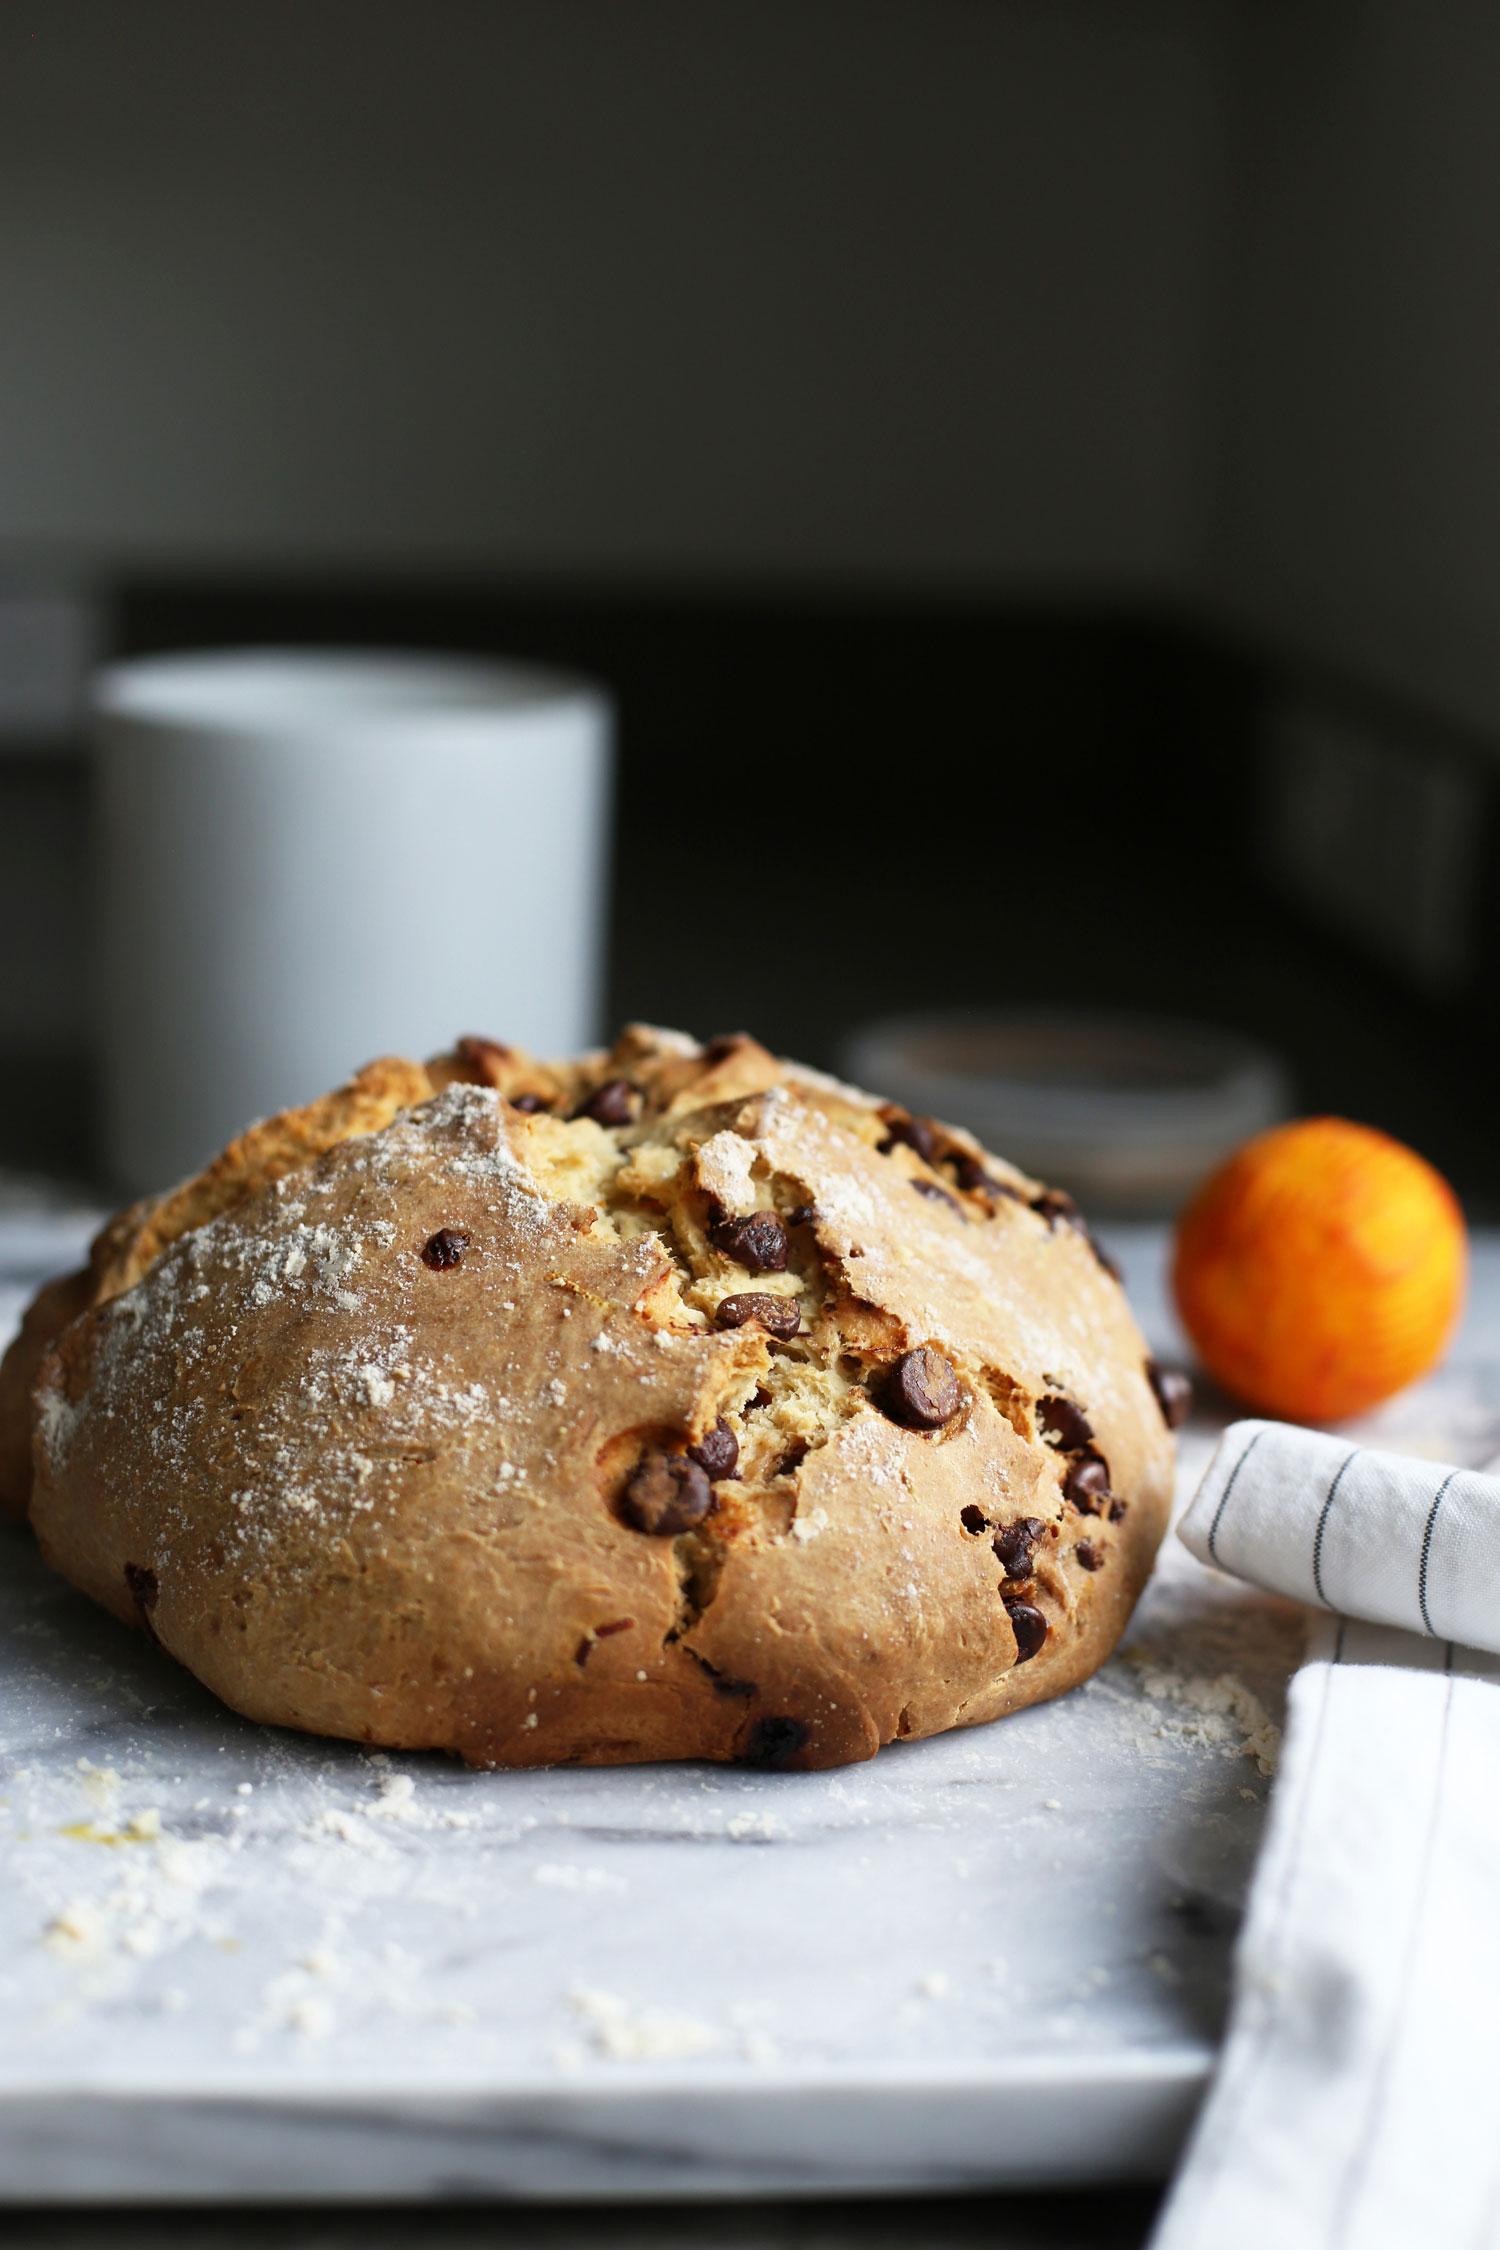 Irish Soda Bread with Orange Zest and Chocolate Chips